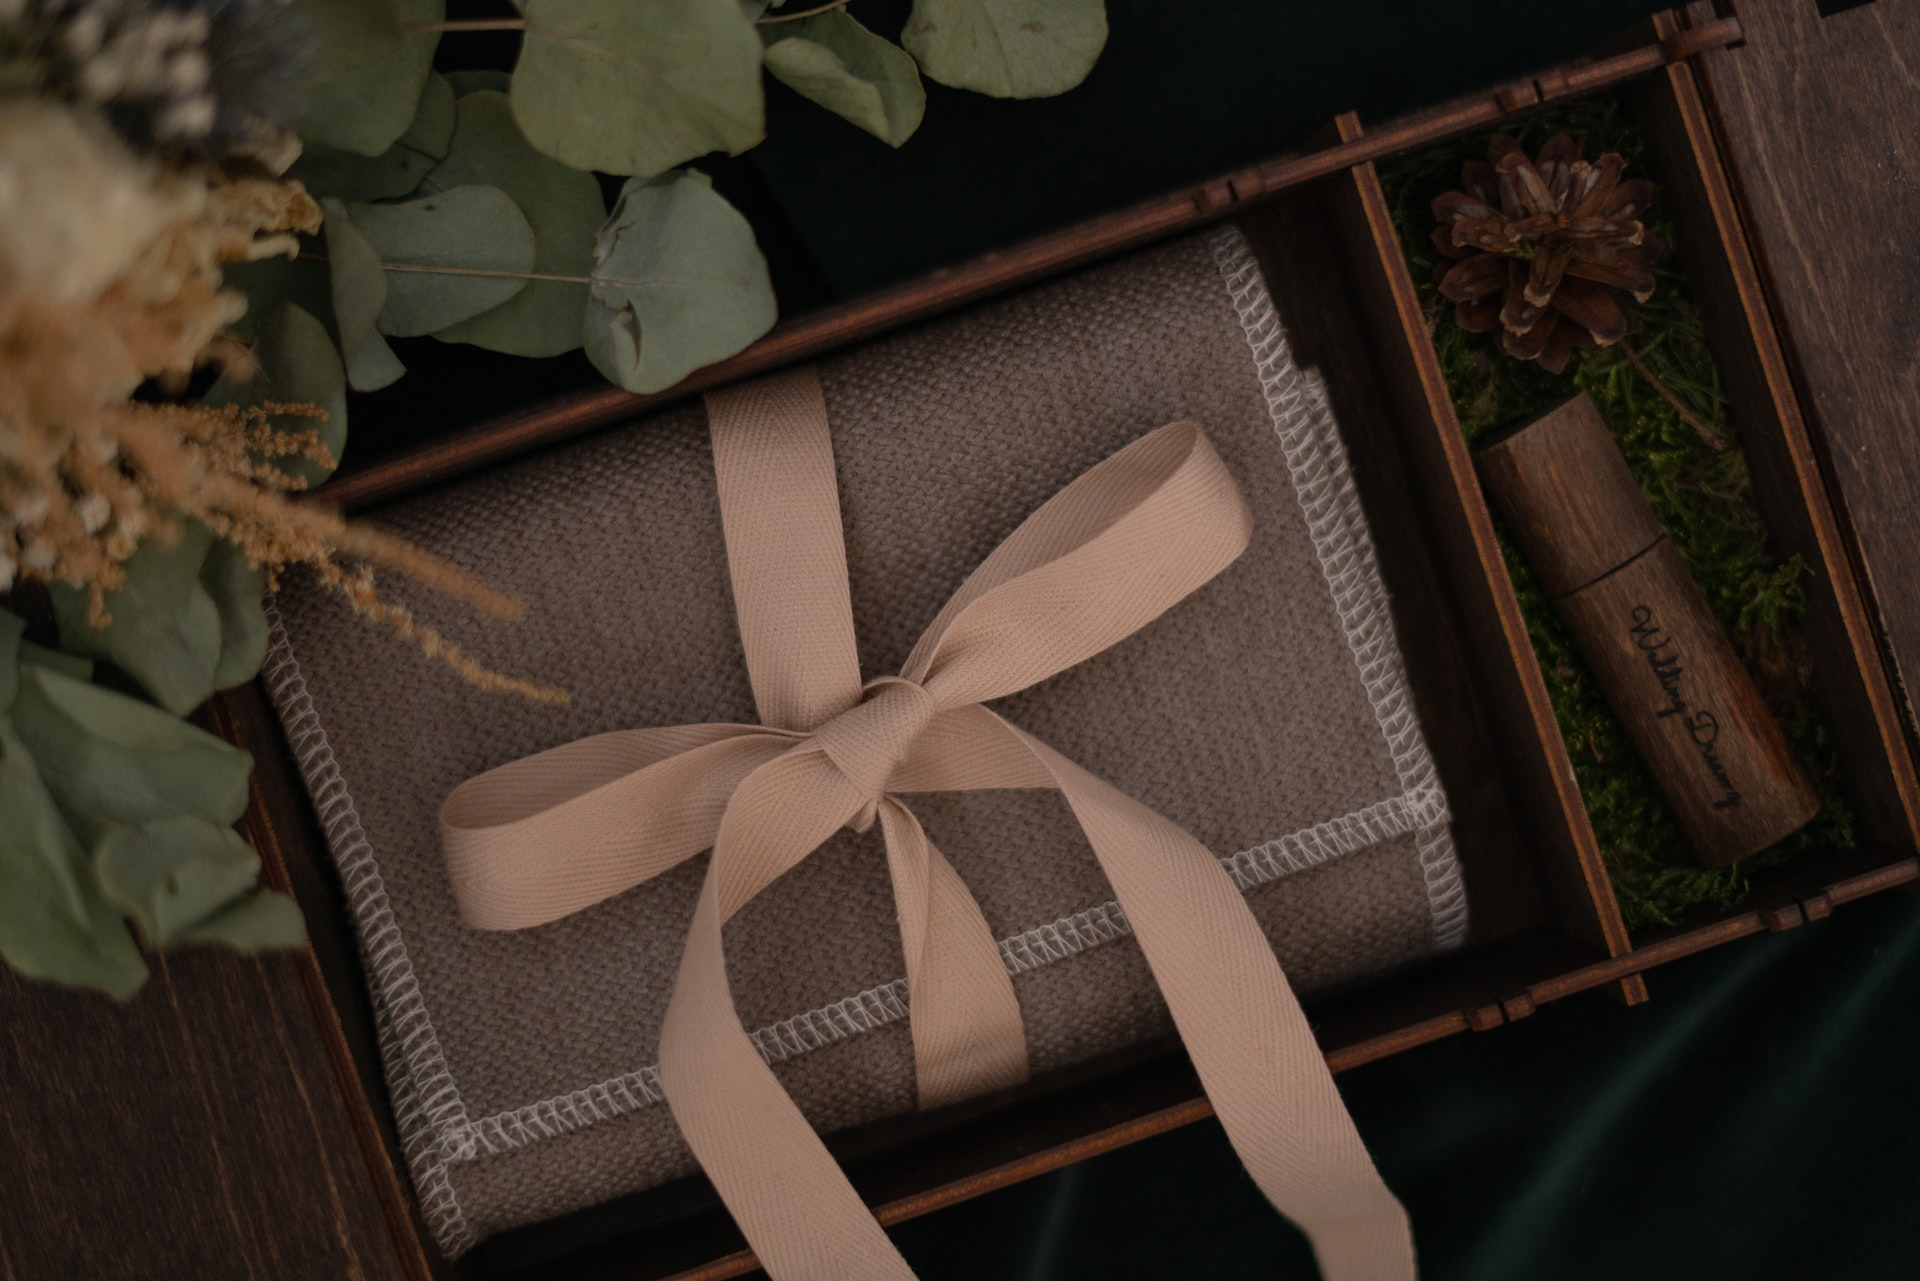 Cadouri pentru miri de la nasi